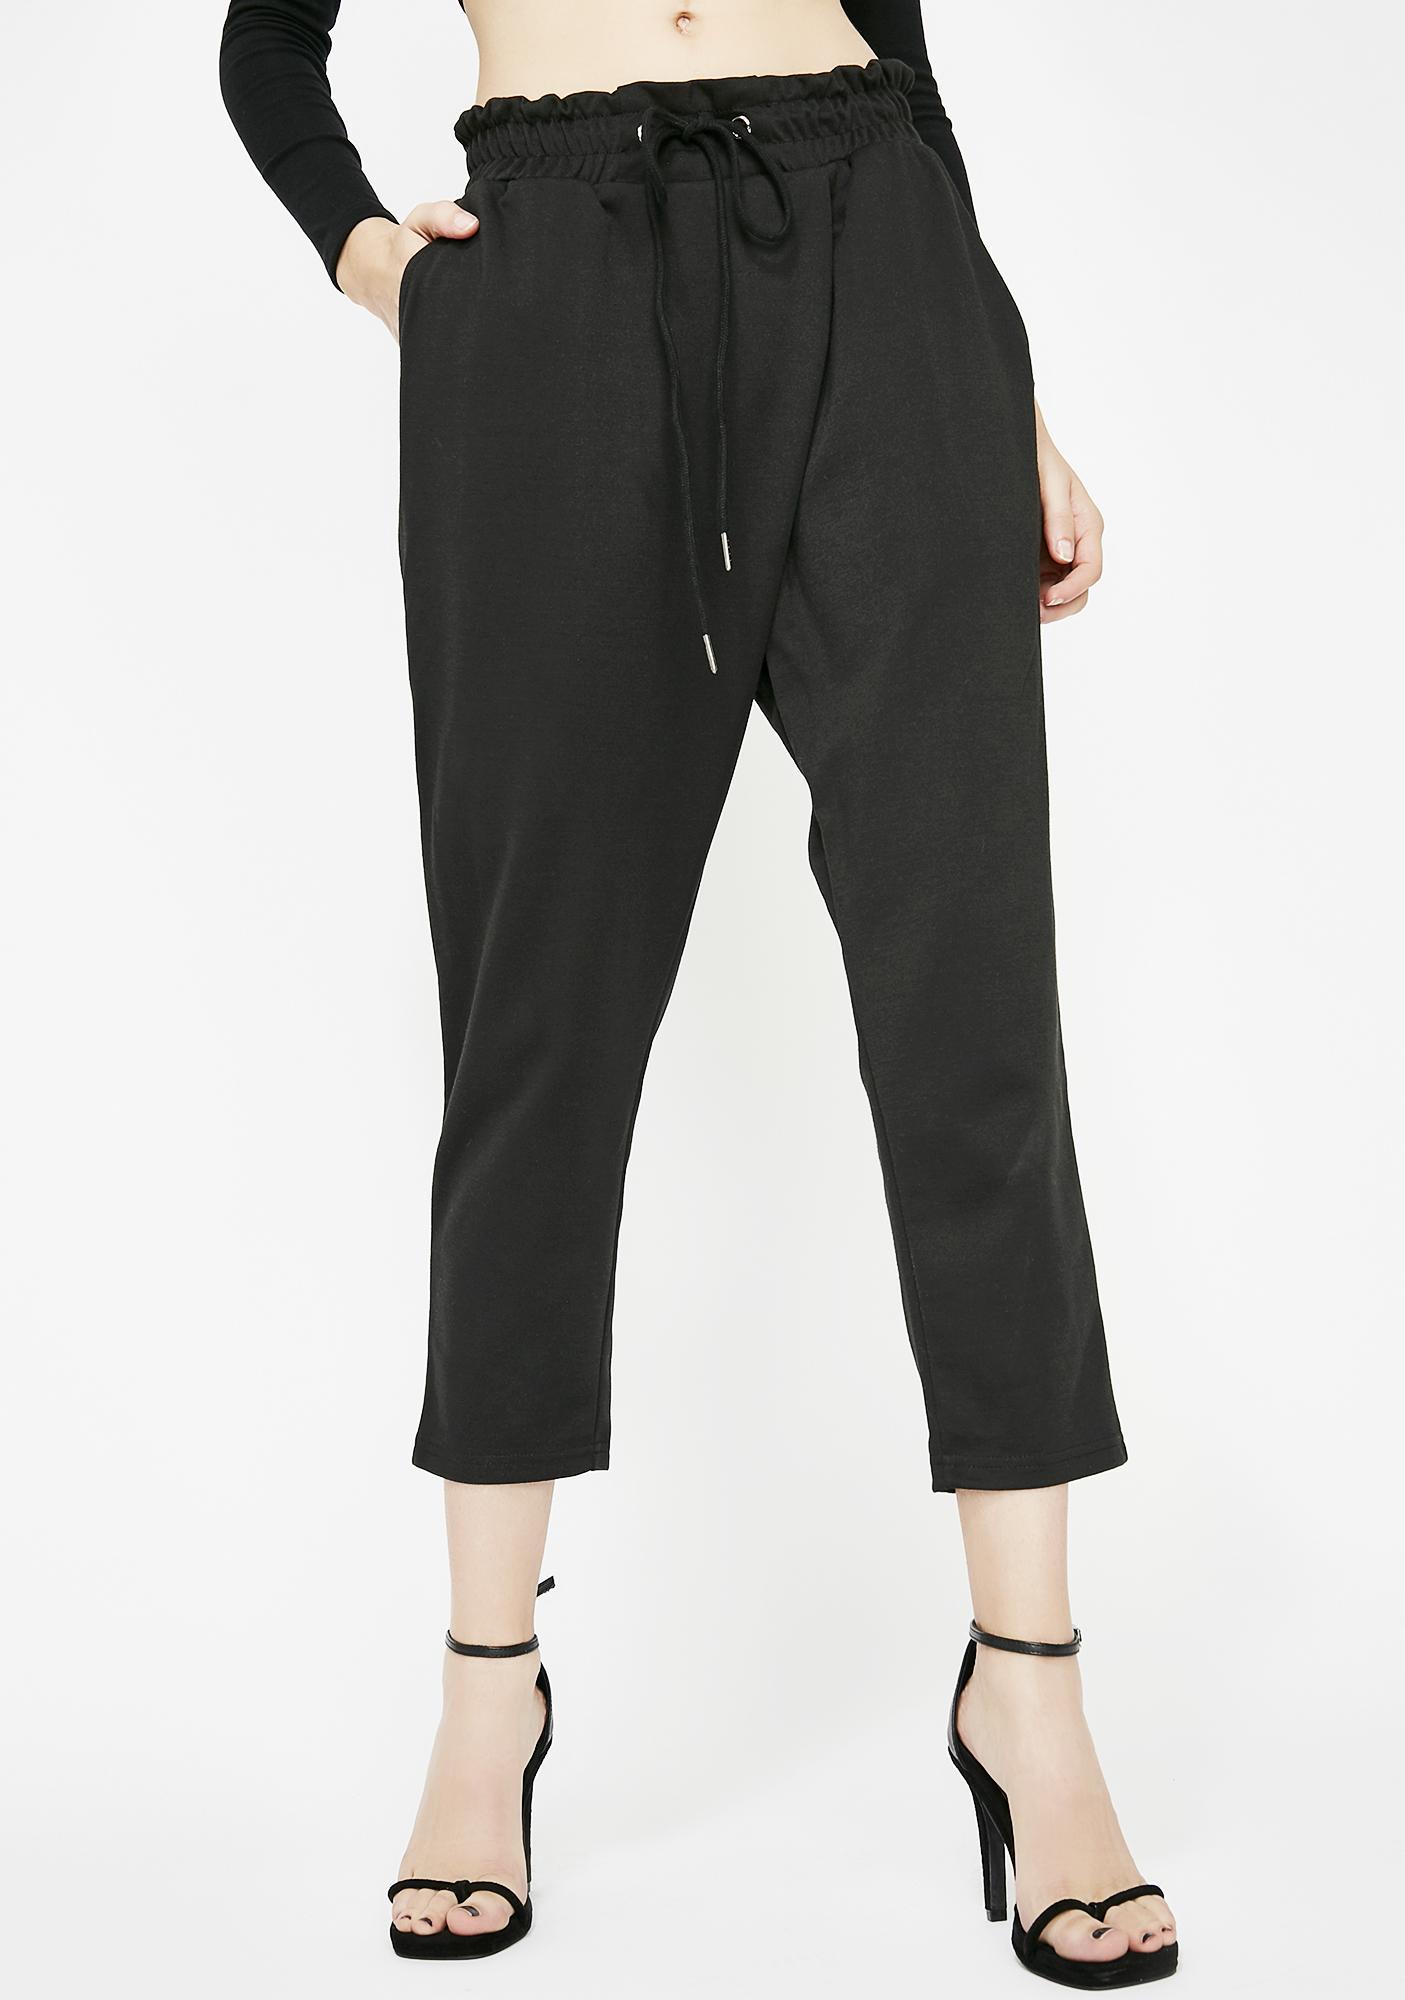 Fempire Drop Crotch Pants